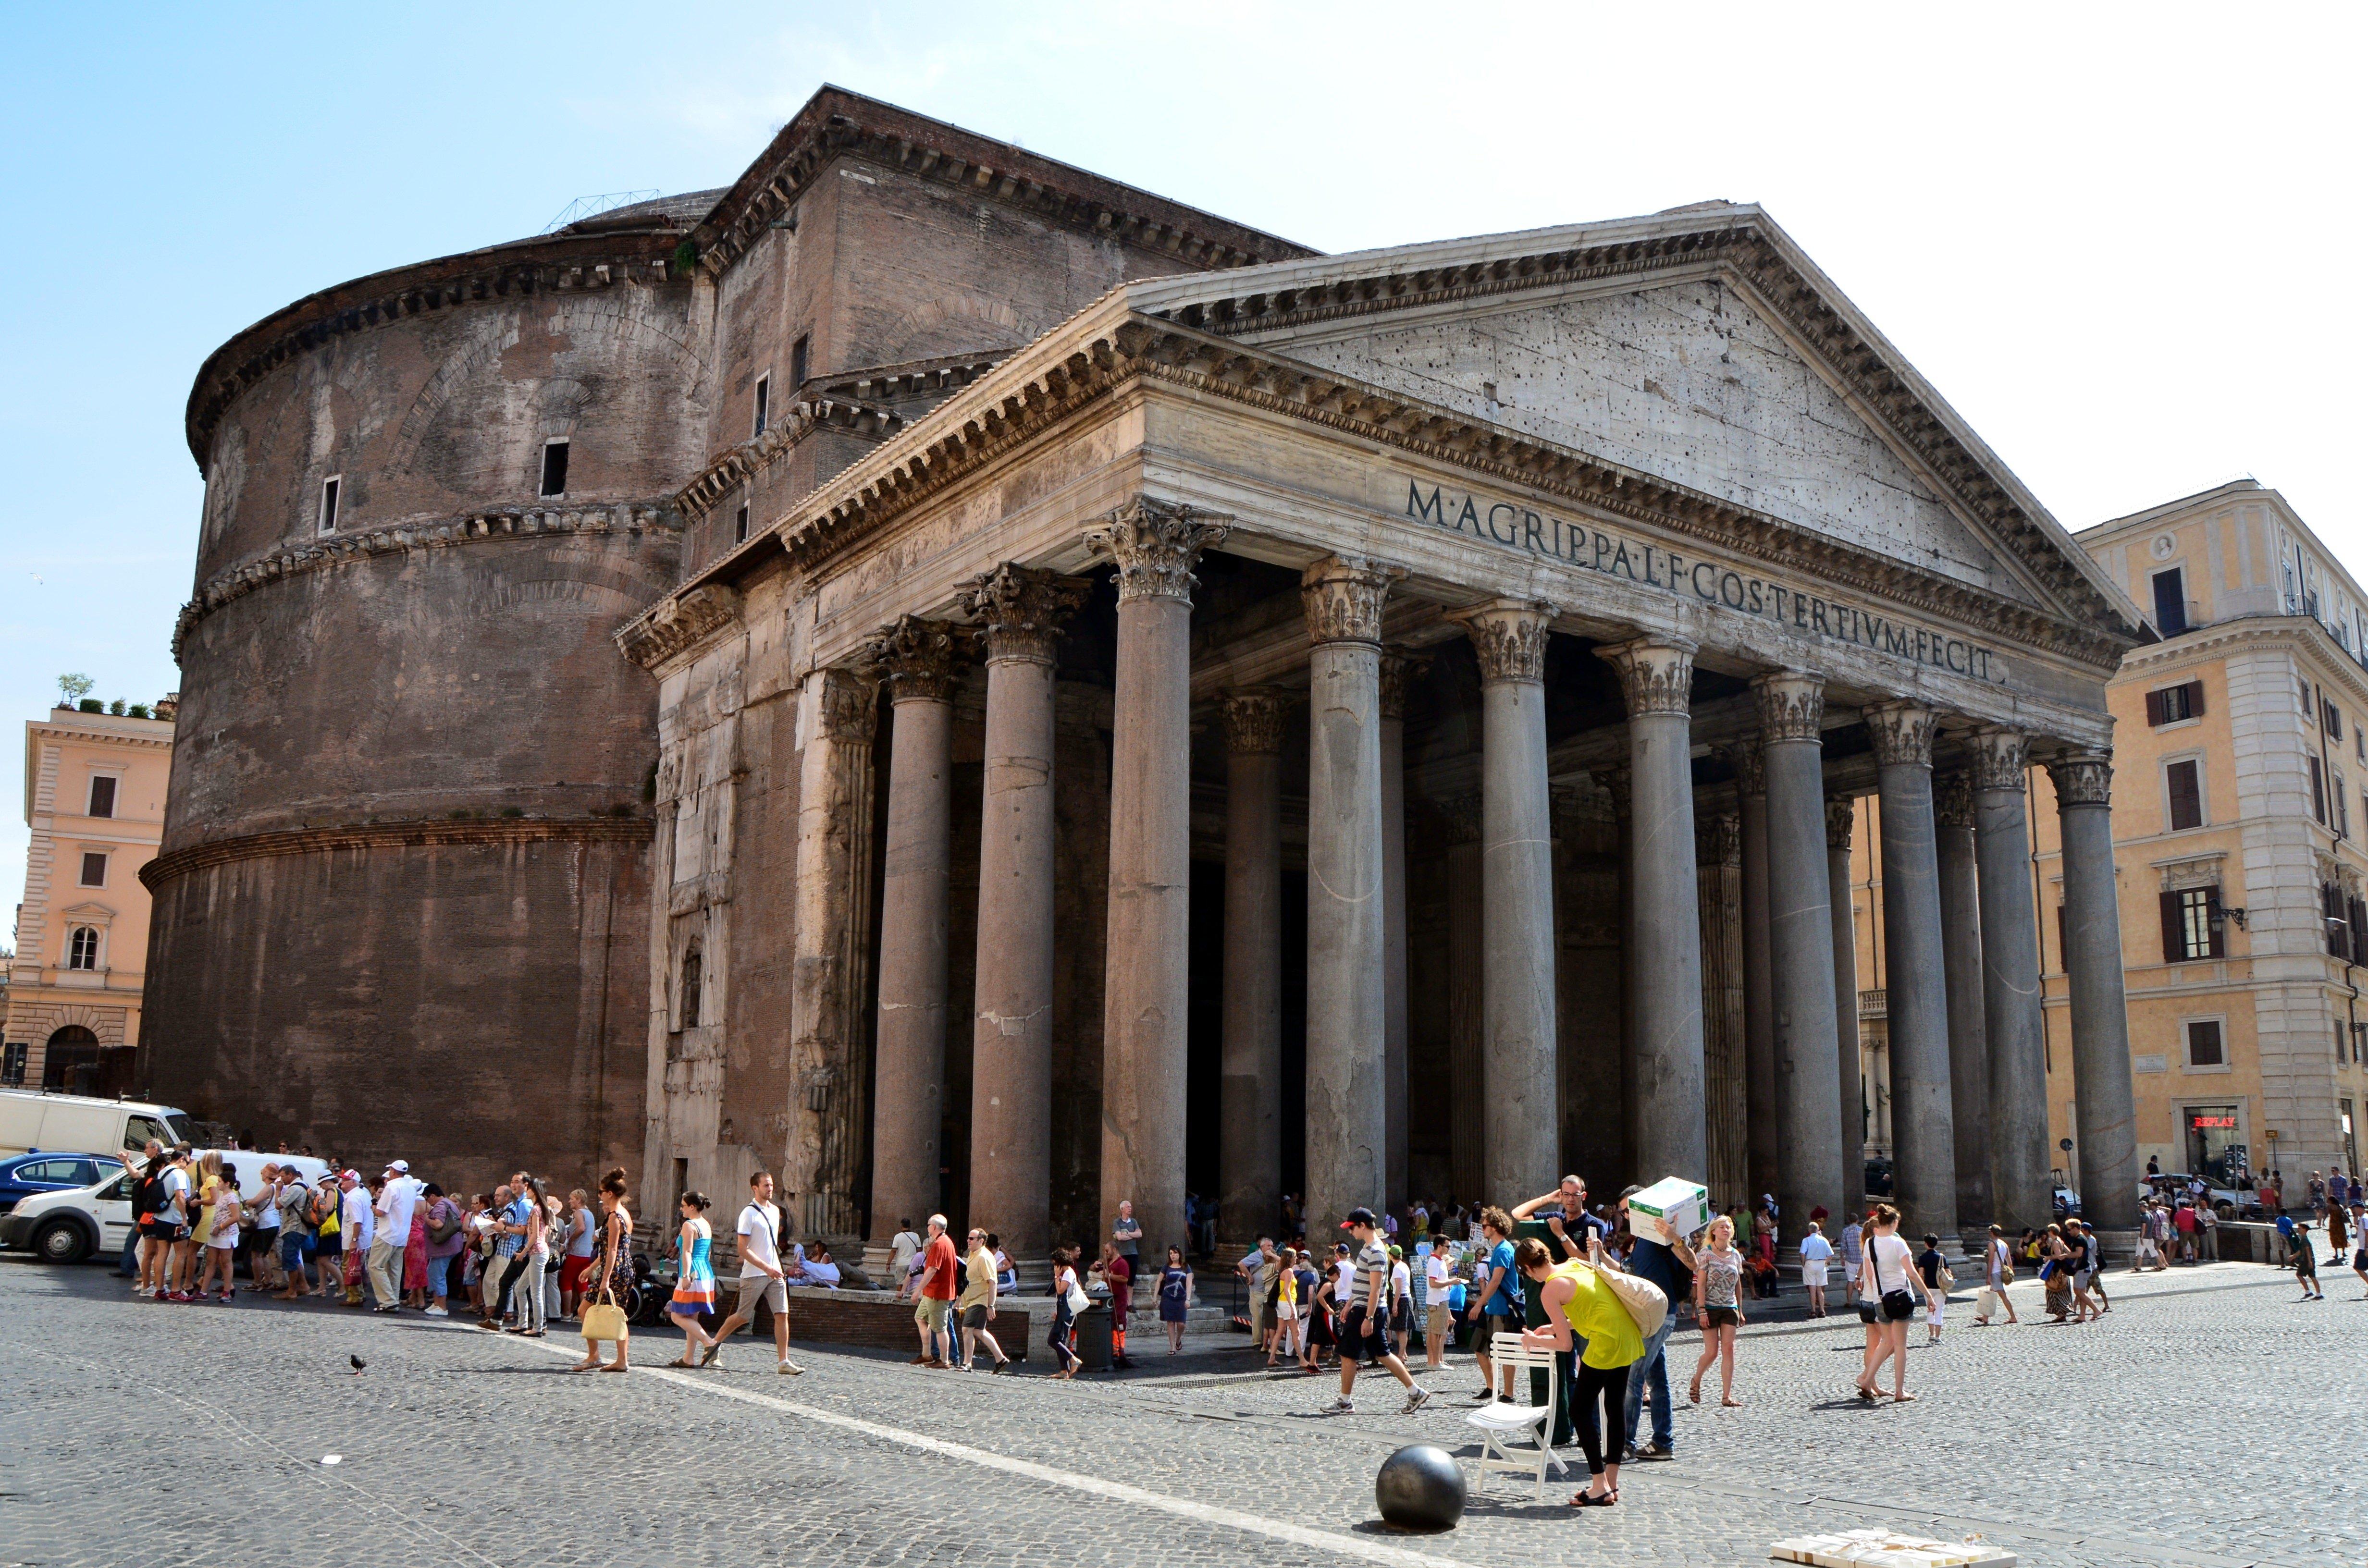 Pantheon, Rome: Hours, Address, Pantheon Reviews: 5/5